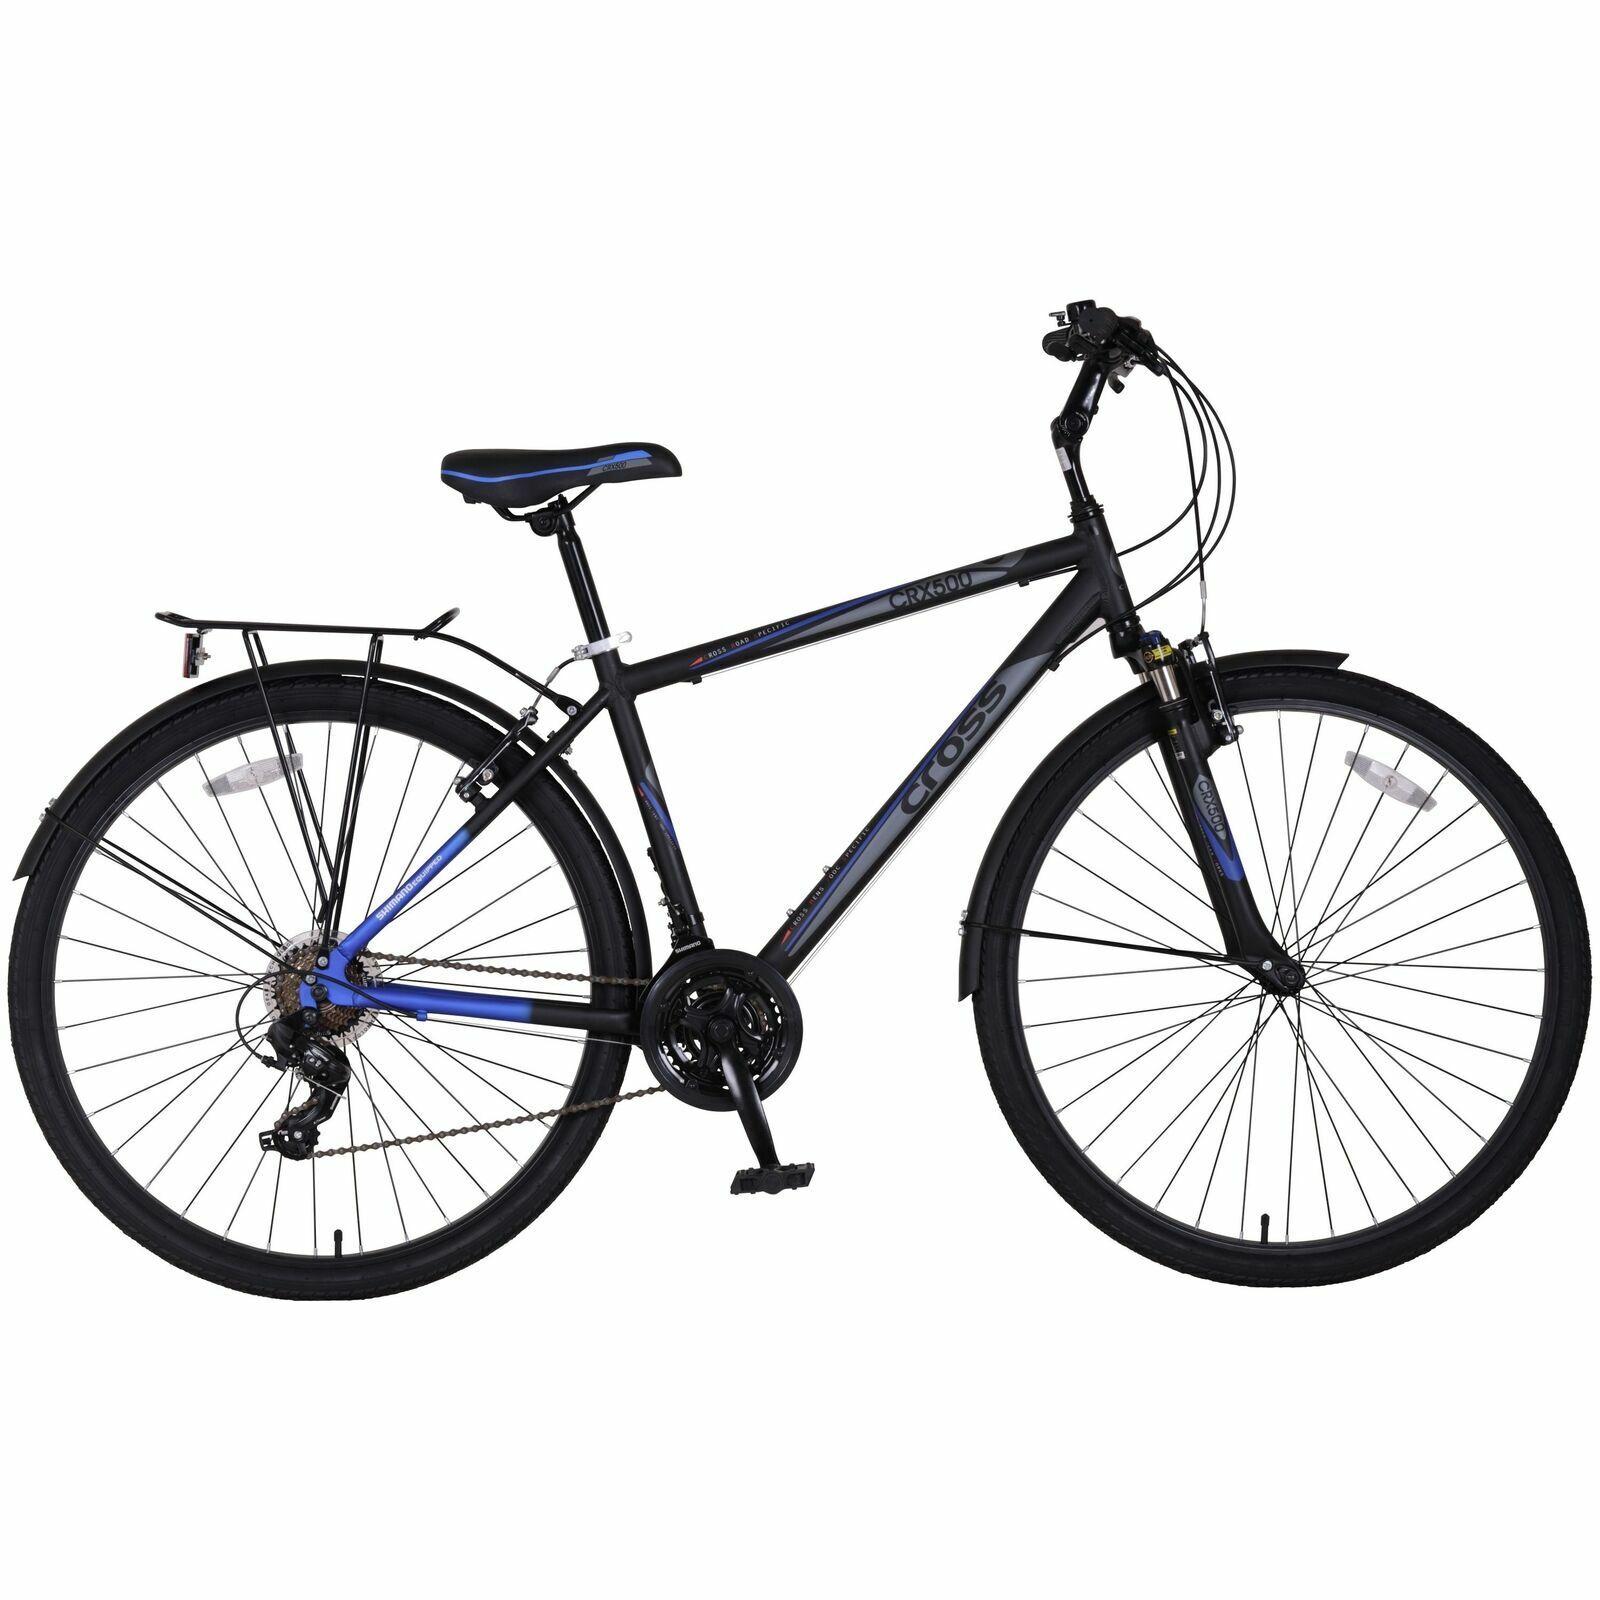 "Cross CRX500 700c 28"" Inch Wheel Hybrid Alloy Bike Bicycle 21 Gears"